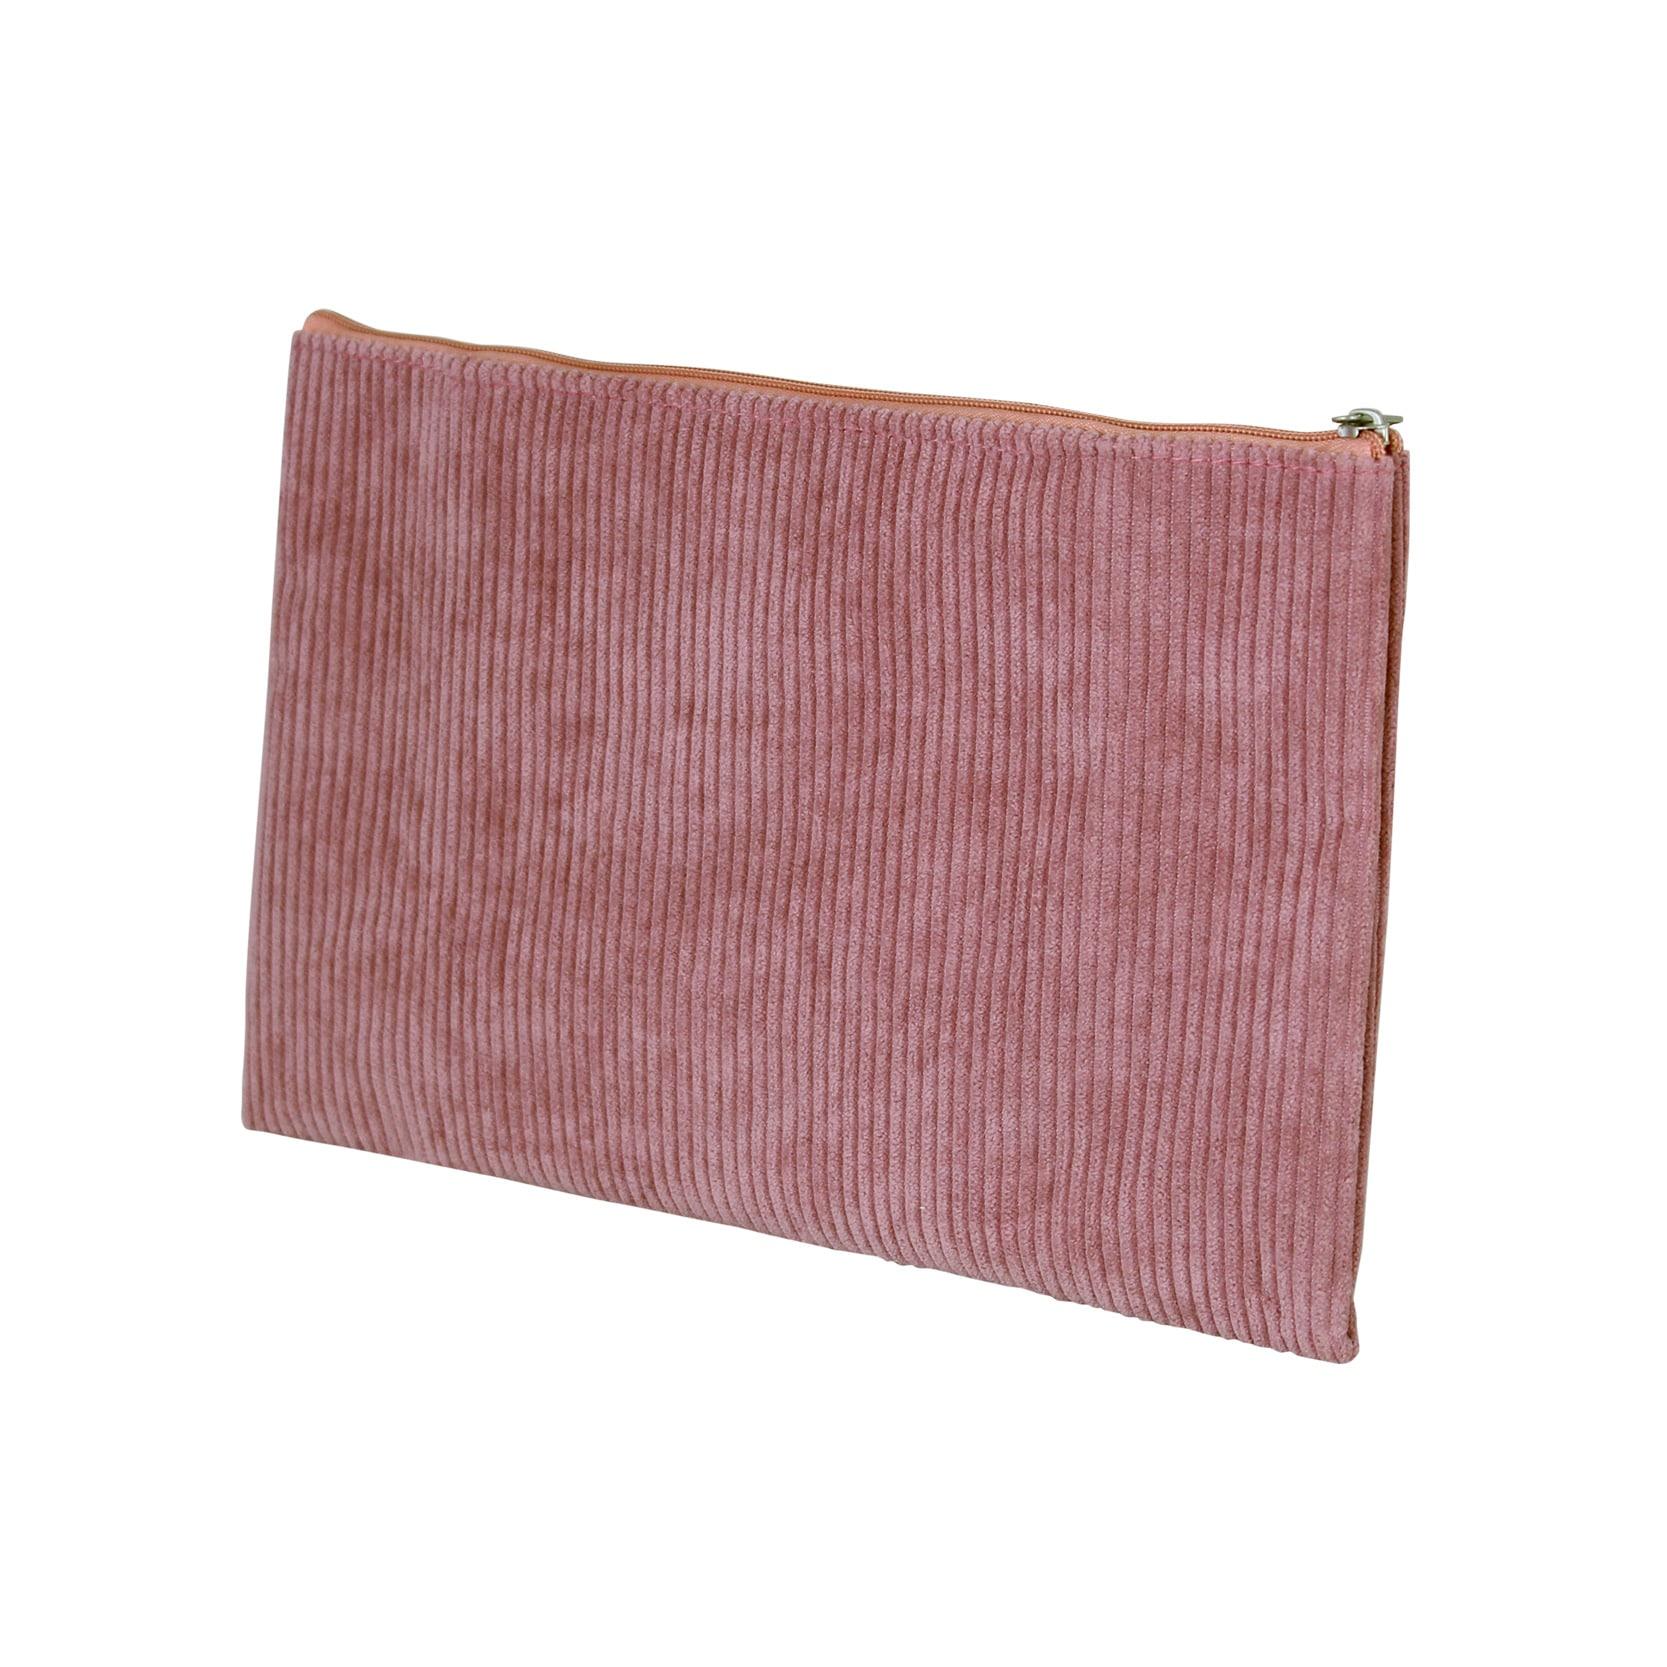 Toilet Bag Corduroy Pink